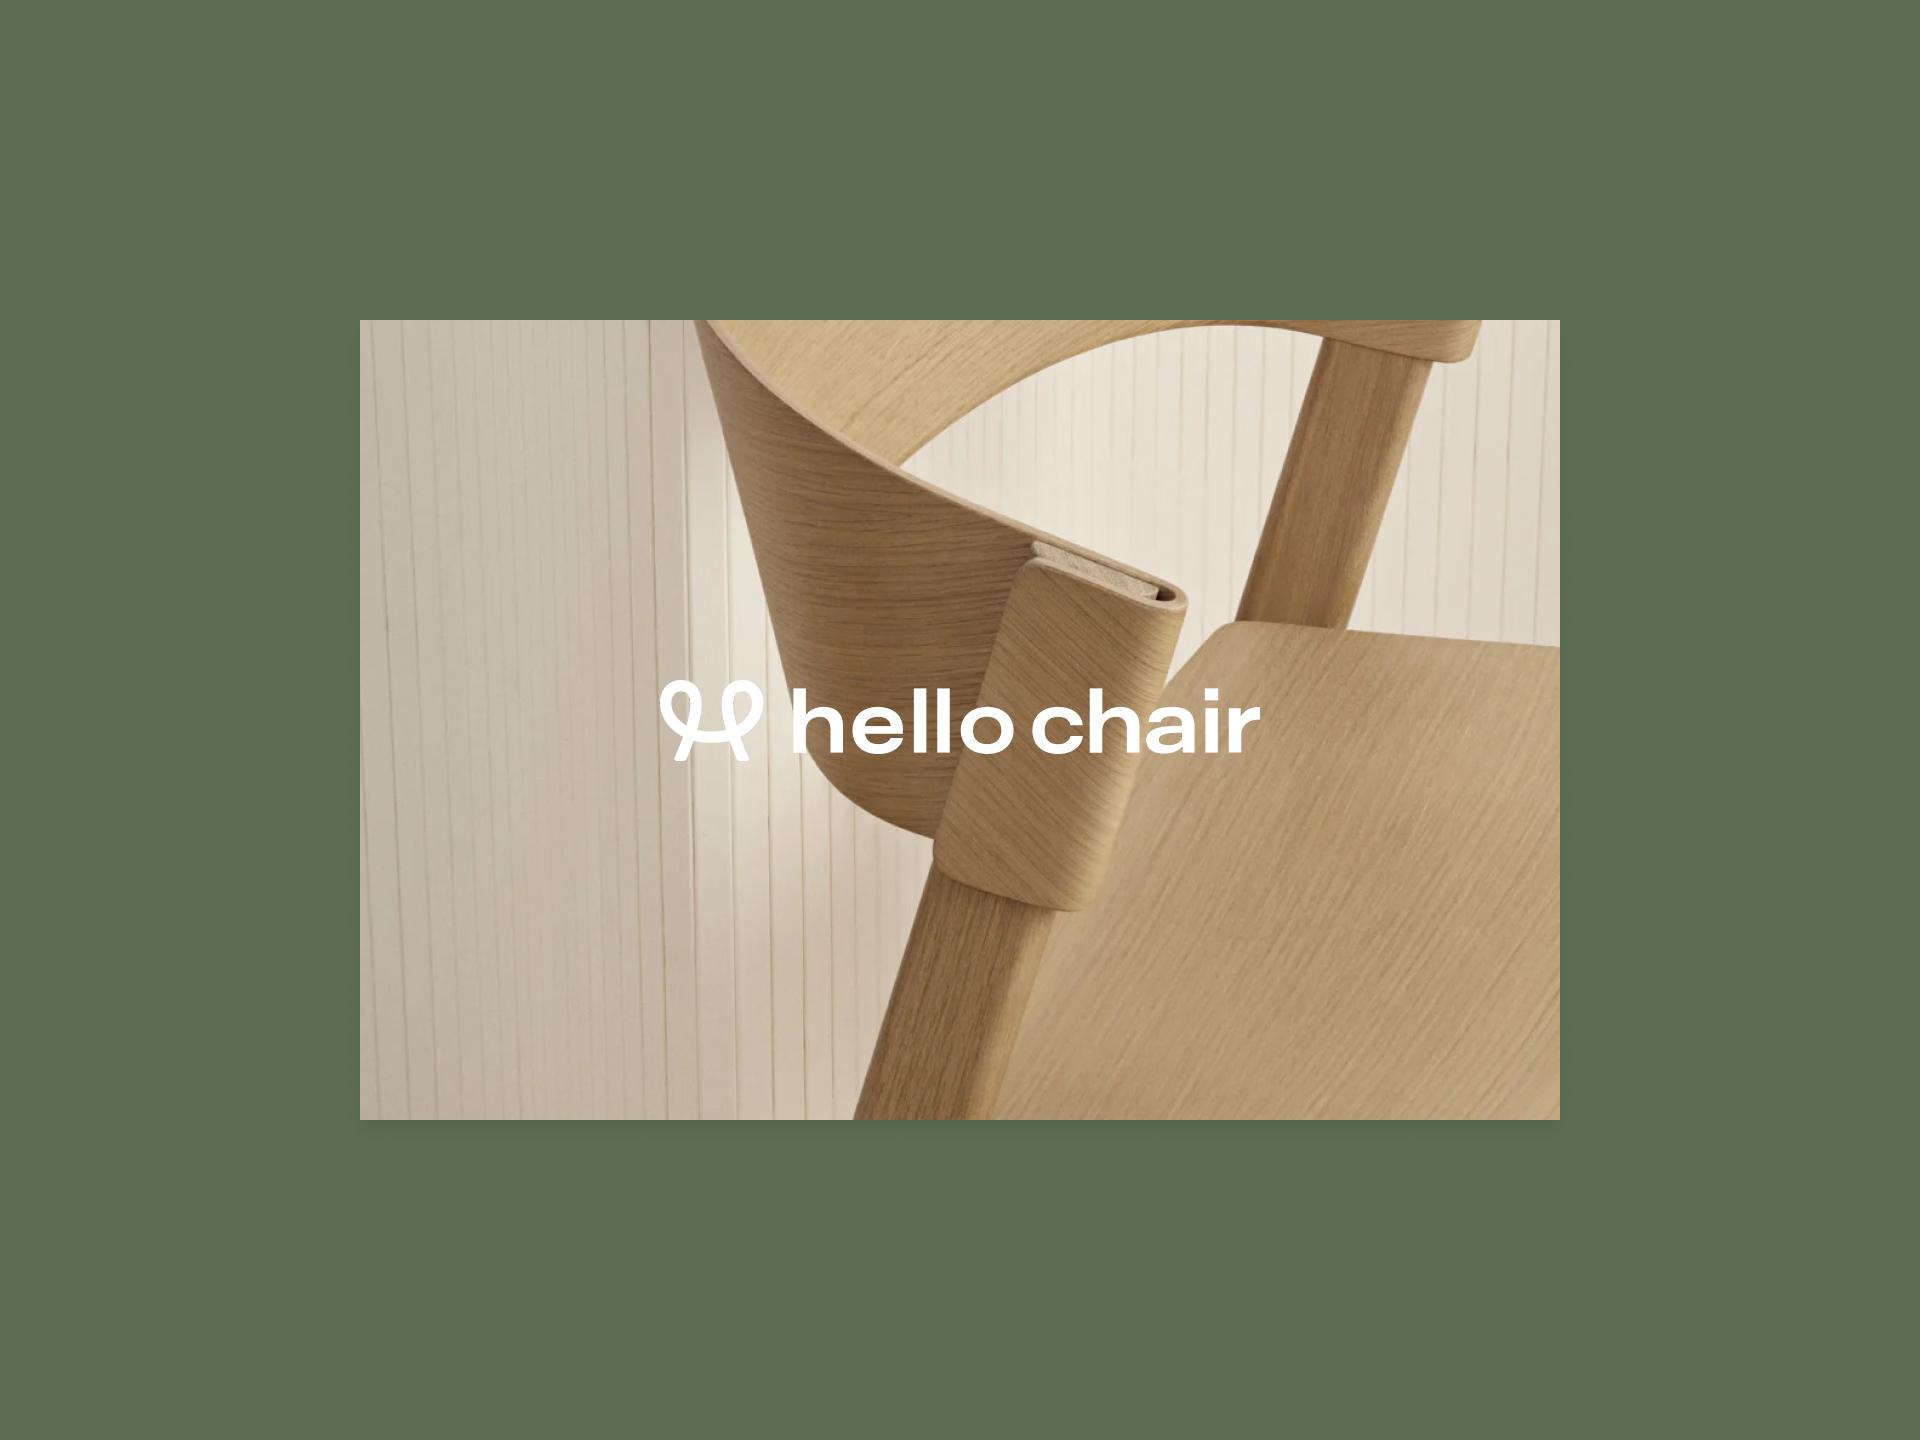 helene-chataigner-hellochair-05b